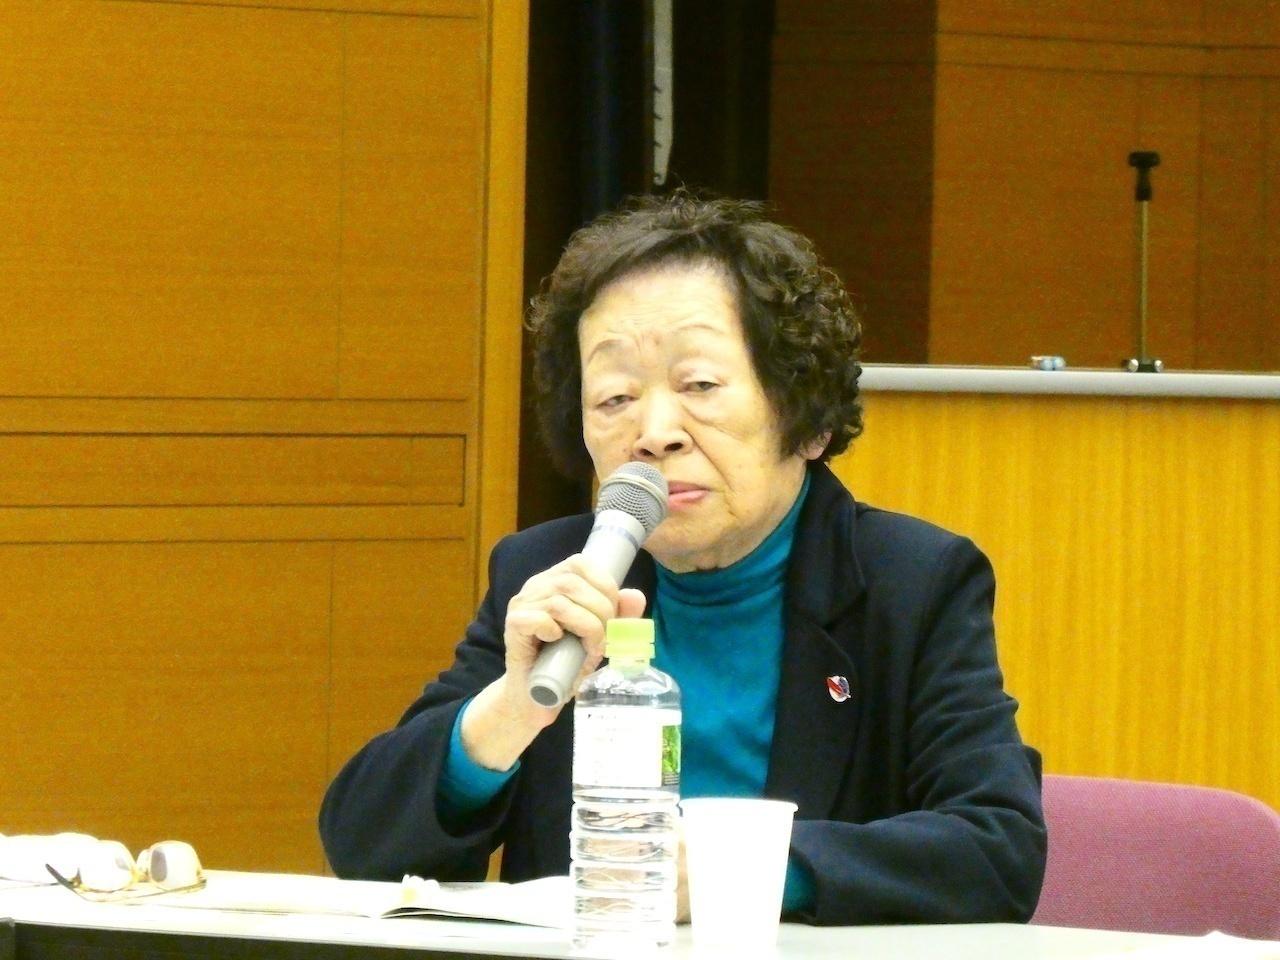 中本忠子氏(特定非営利活動法人「食べて語ろう会」理事長/元保護司)